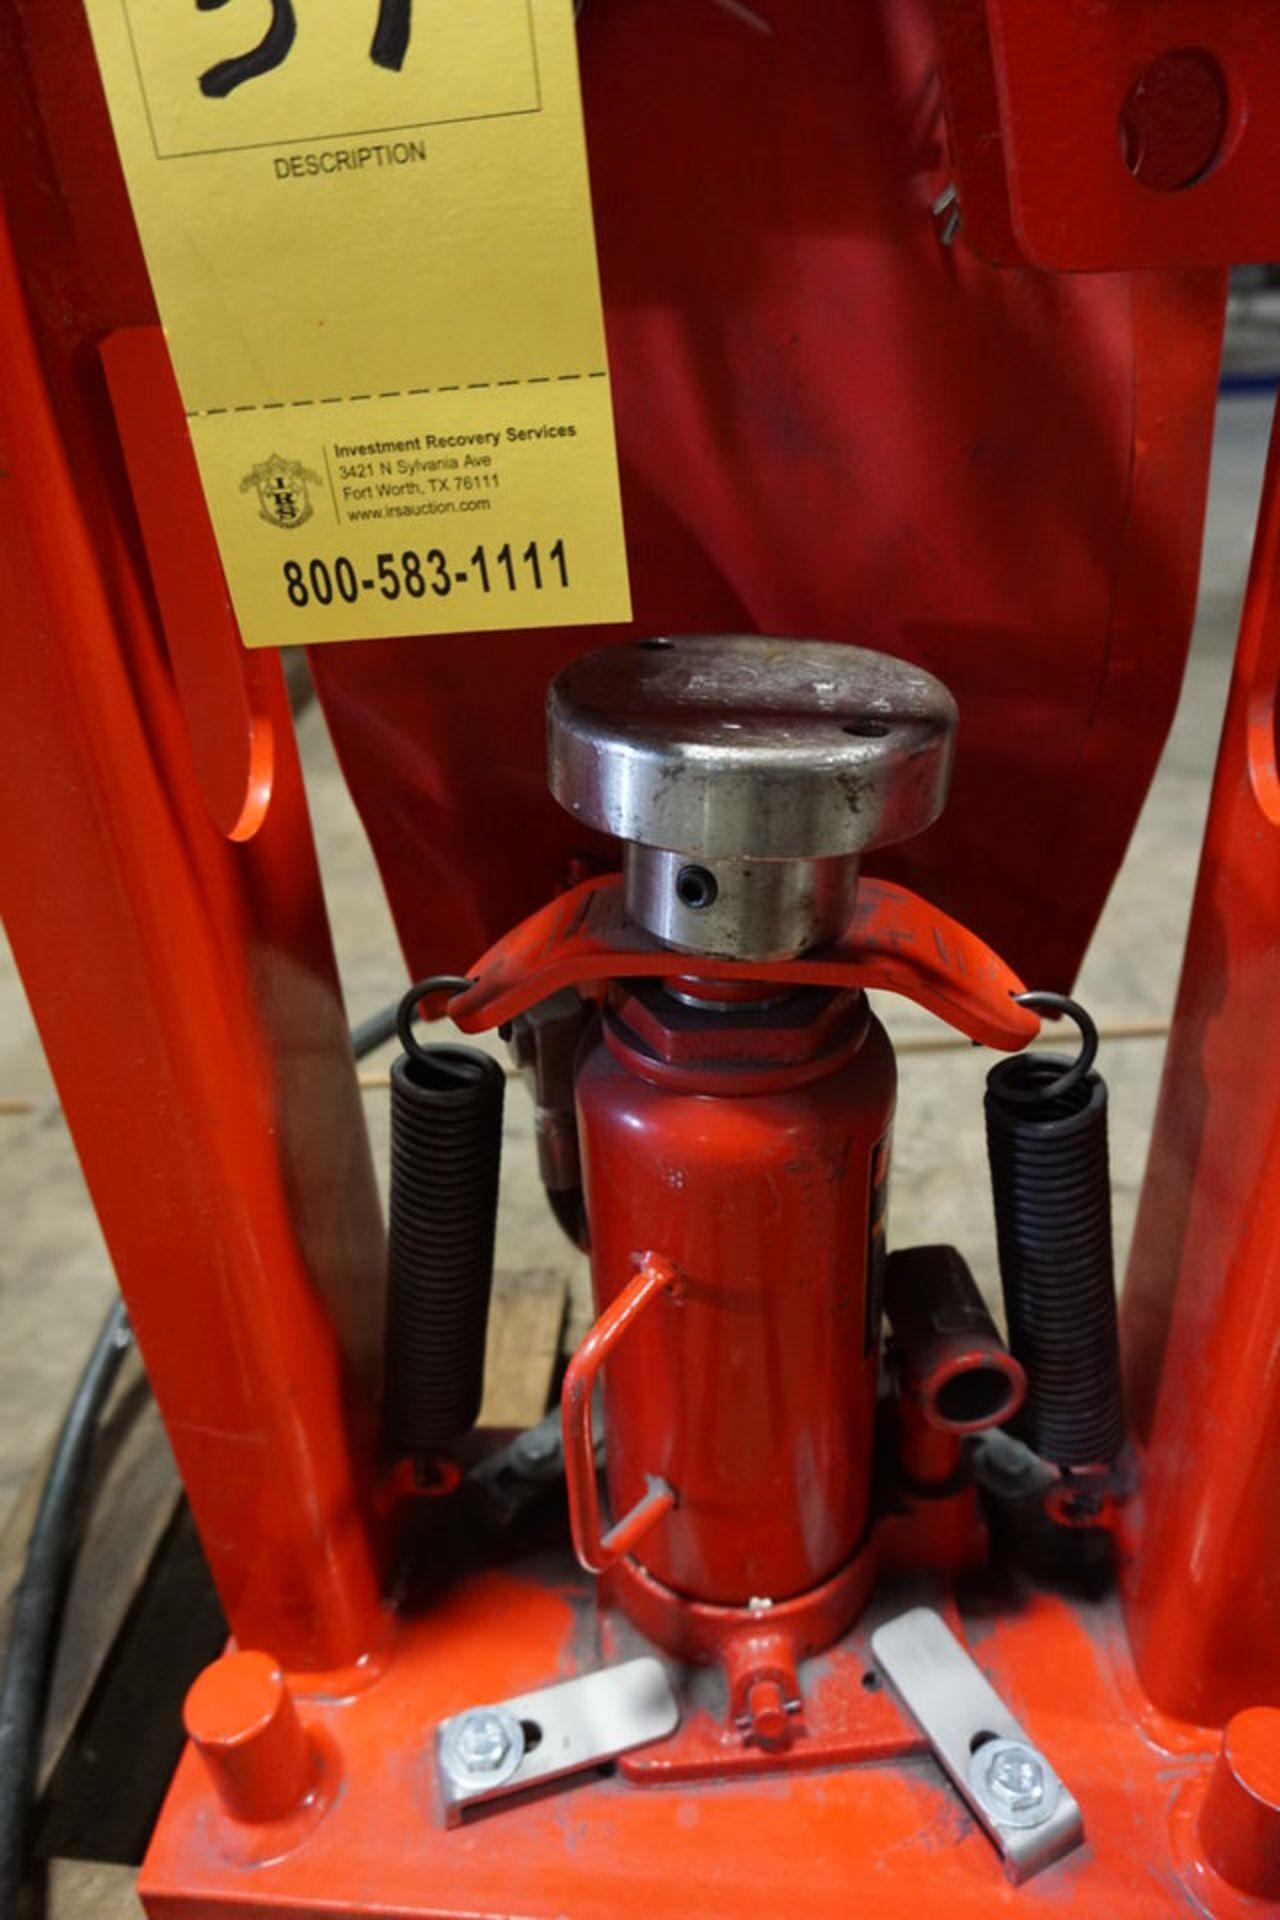 Lot 39 - BIG RED 12 TON HYDRAULIC BENCH PRESS (Location: 903 Blue Starr, Claremore, OK 74017)